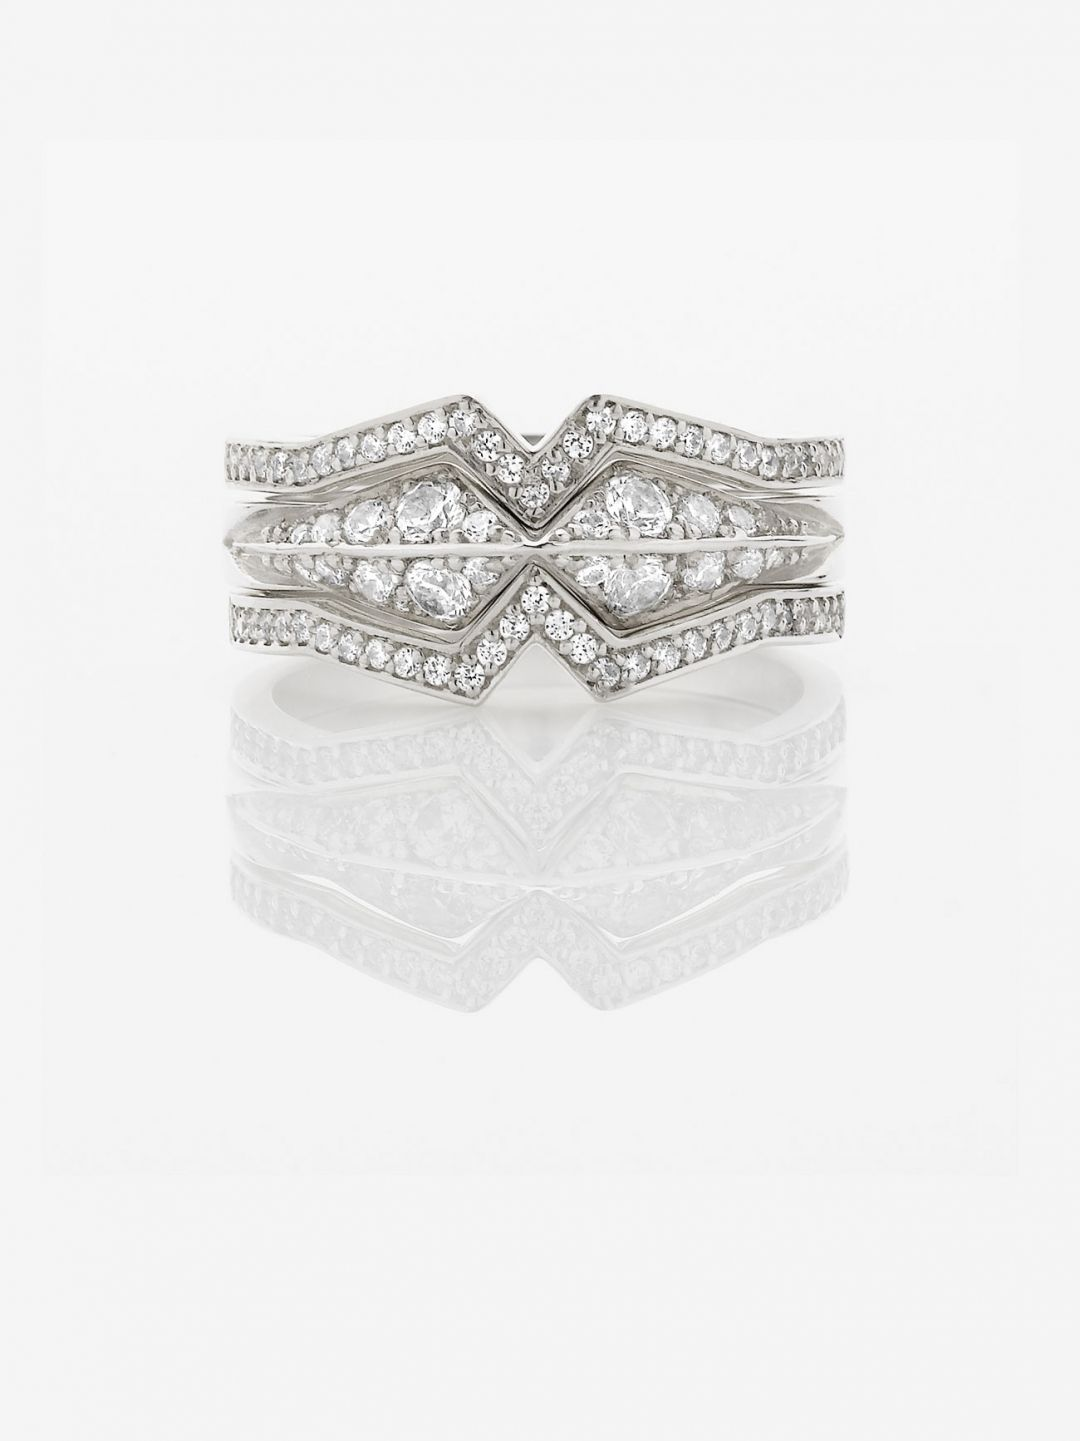 Meadowlark Jewellery / Pure Metals & Precious Stones / Stockists Worldwide / View more: http://thelane.com/brands-we-love/meadowlark